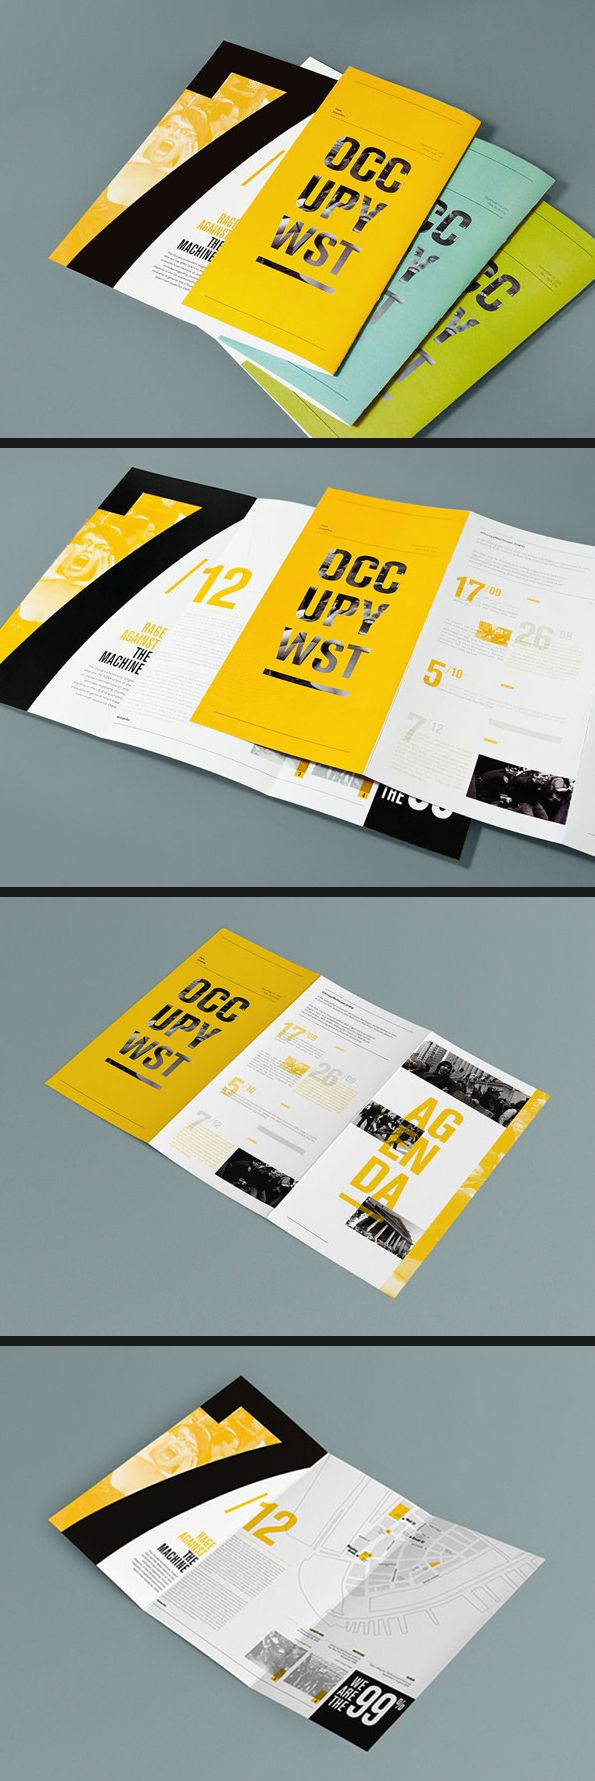 OCC UPY WST创意三折页设计